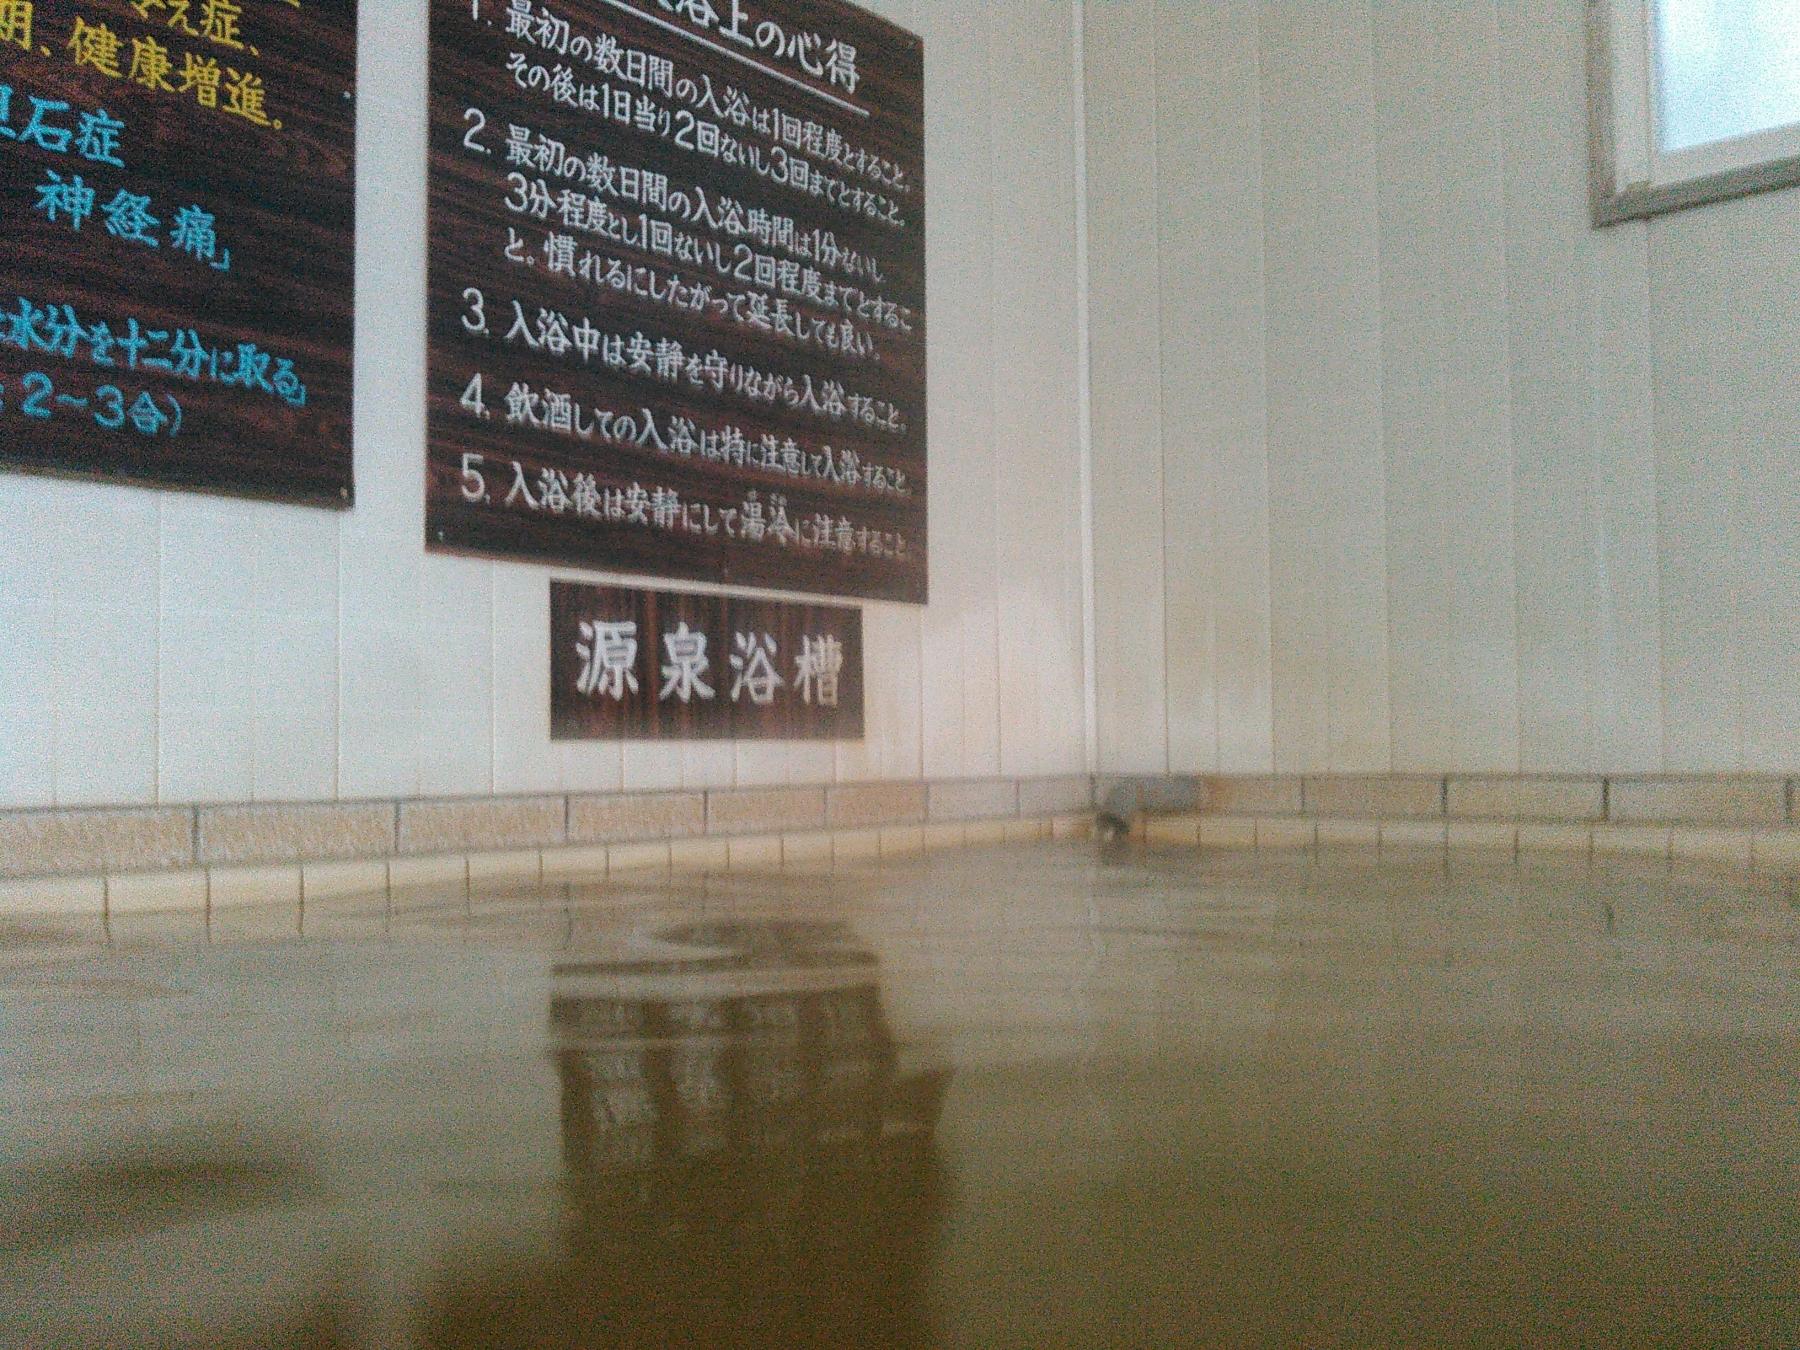 Oga hot spring Tianyu hot spring